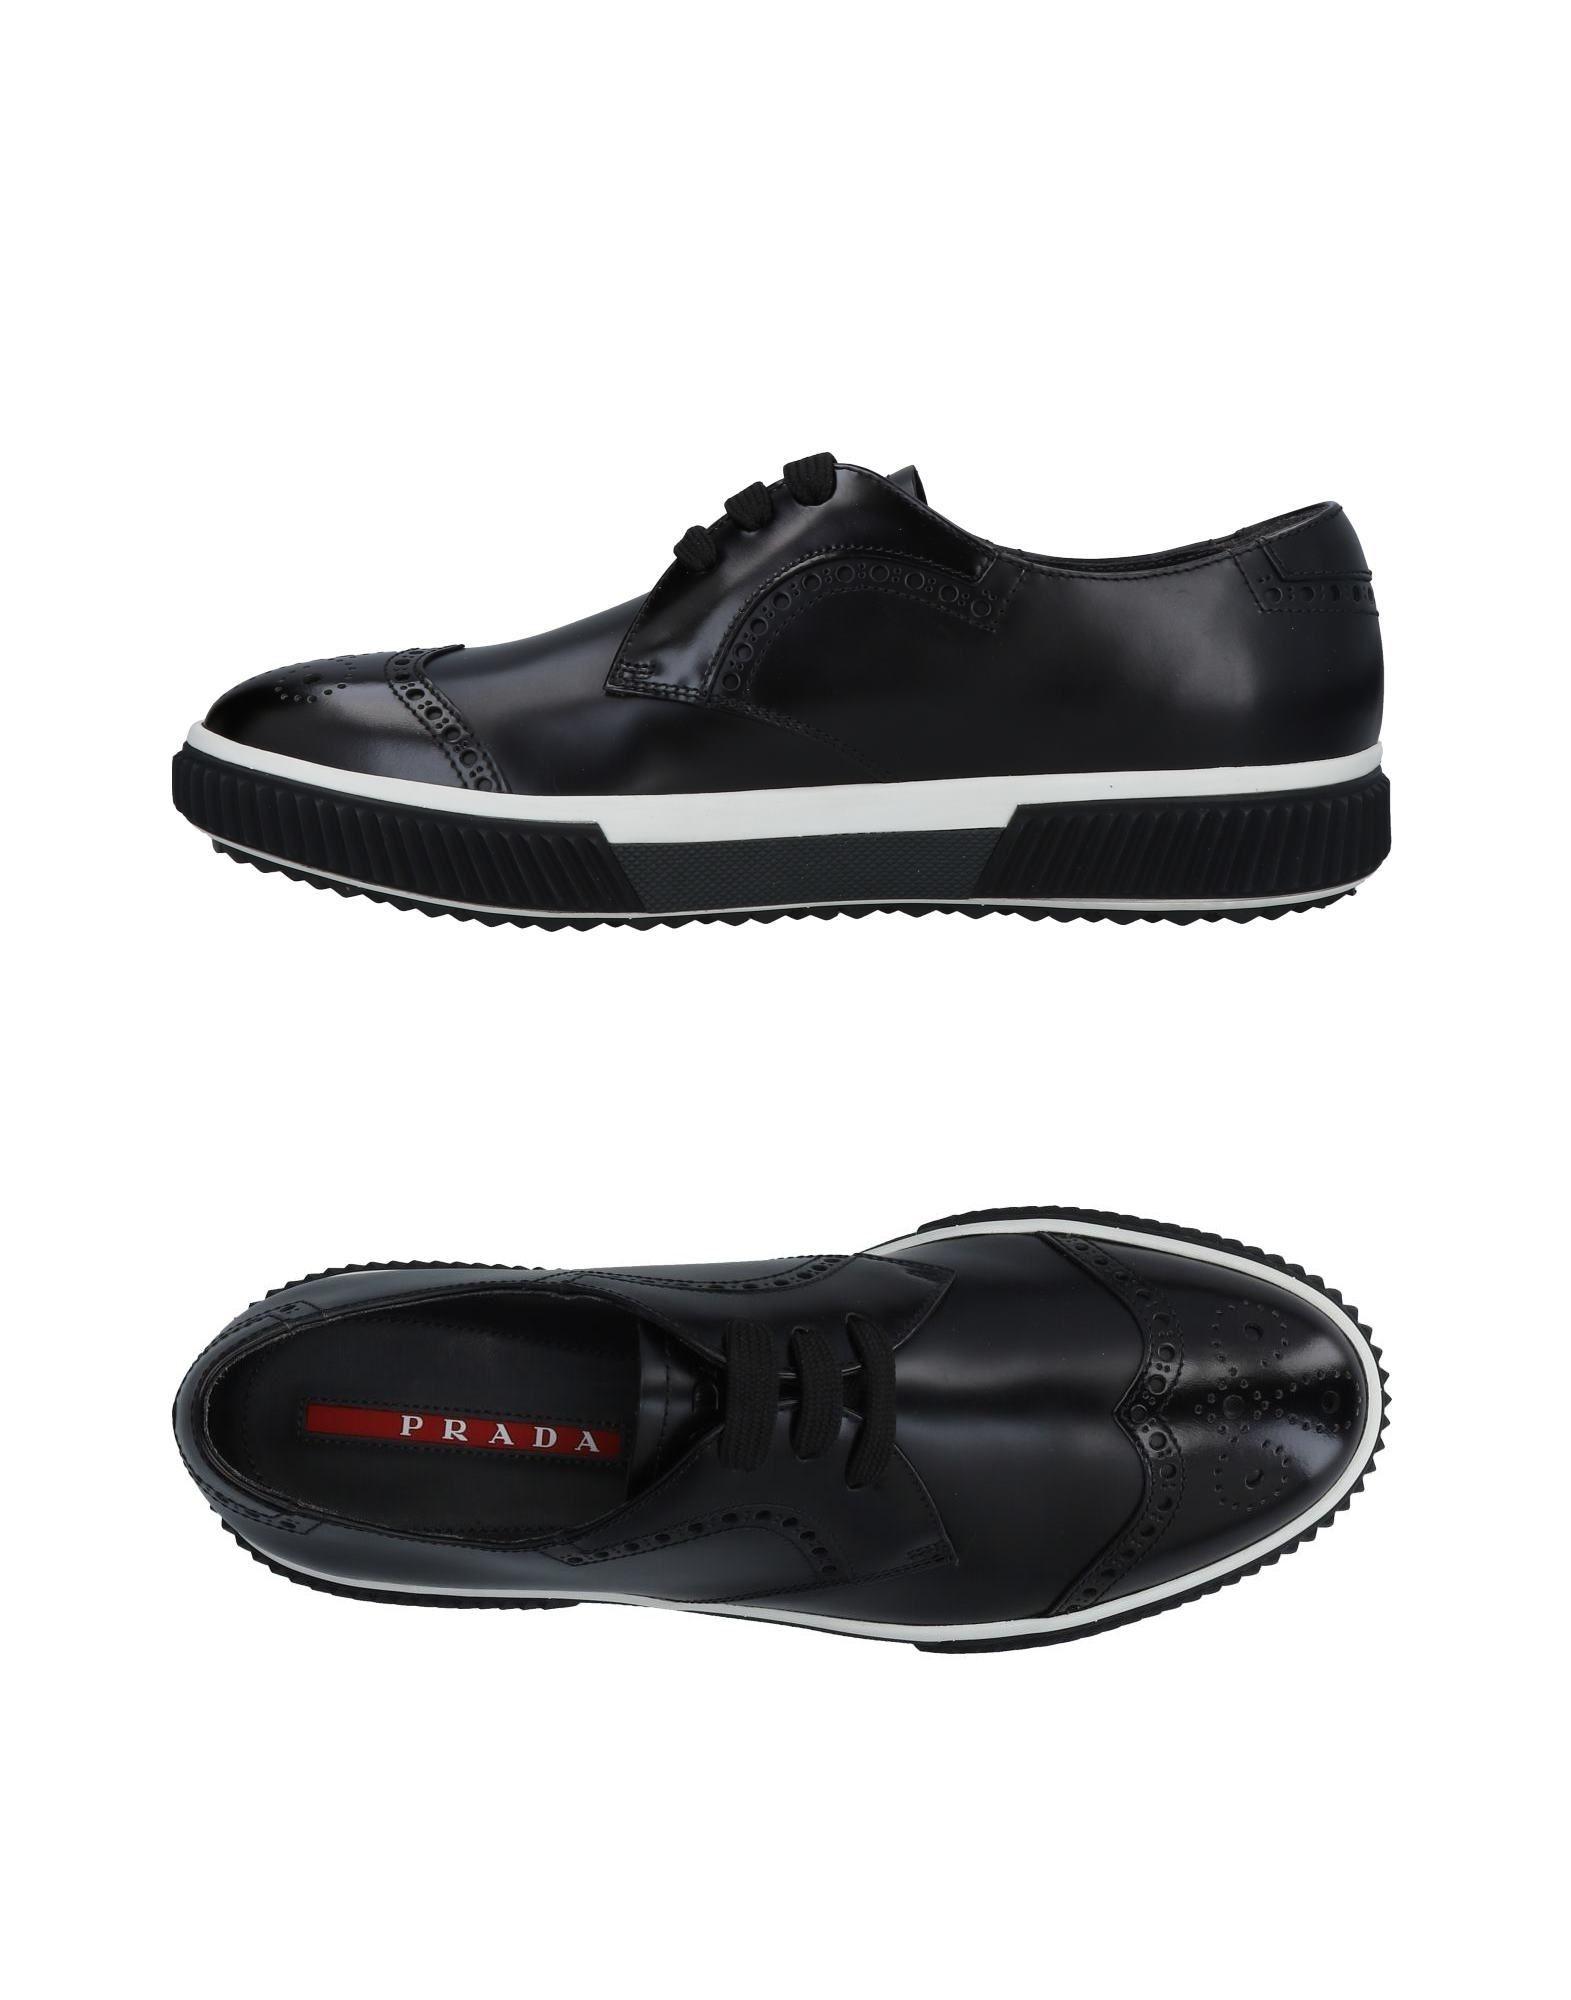 PRADA SPORT Обувь на шнурках цены онлайн